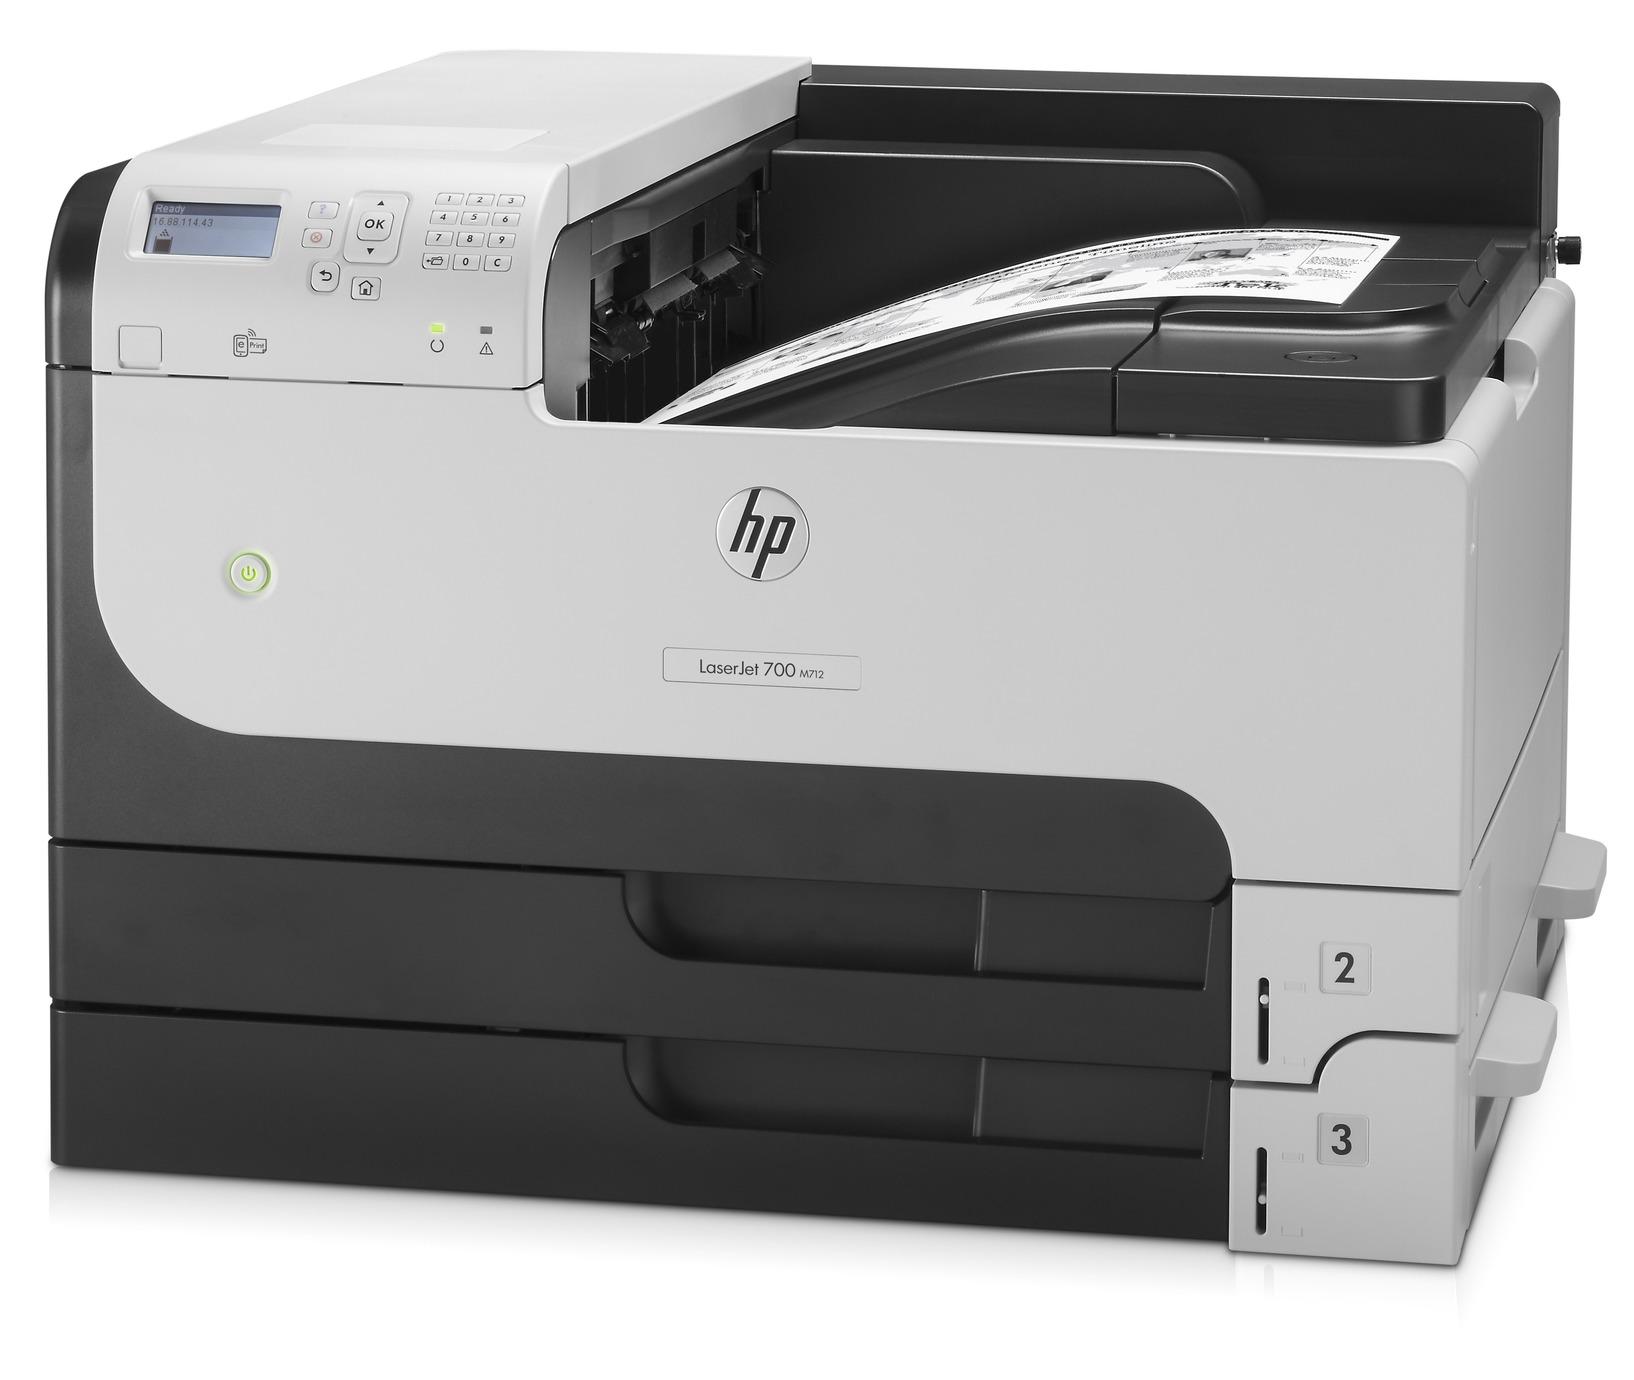 Tiskárna HP LaserJet Enterprise 700 M712dn A3 čb/41str  USB  LAN  duplex  0,39Kč